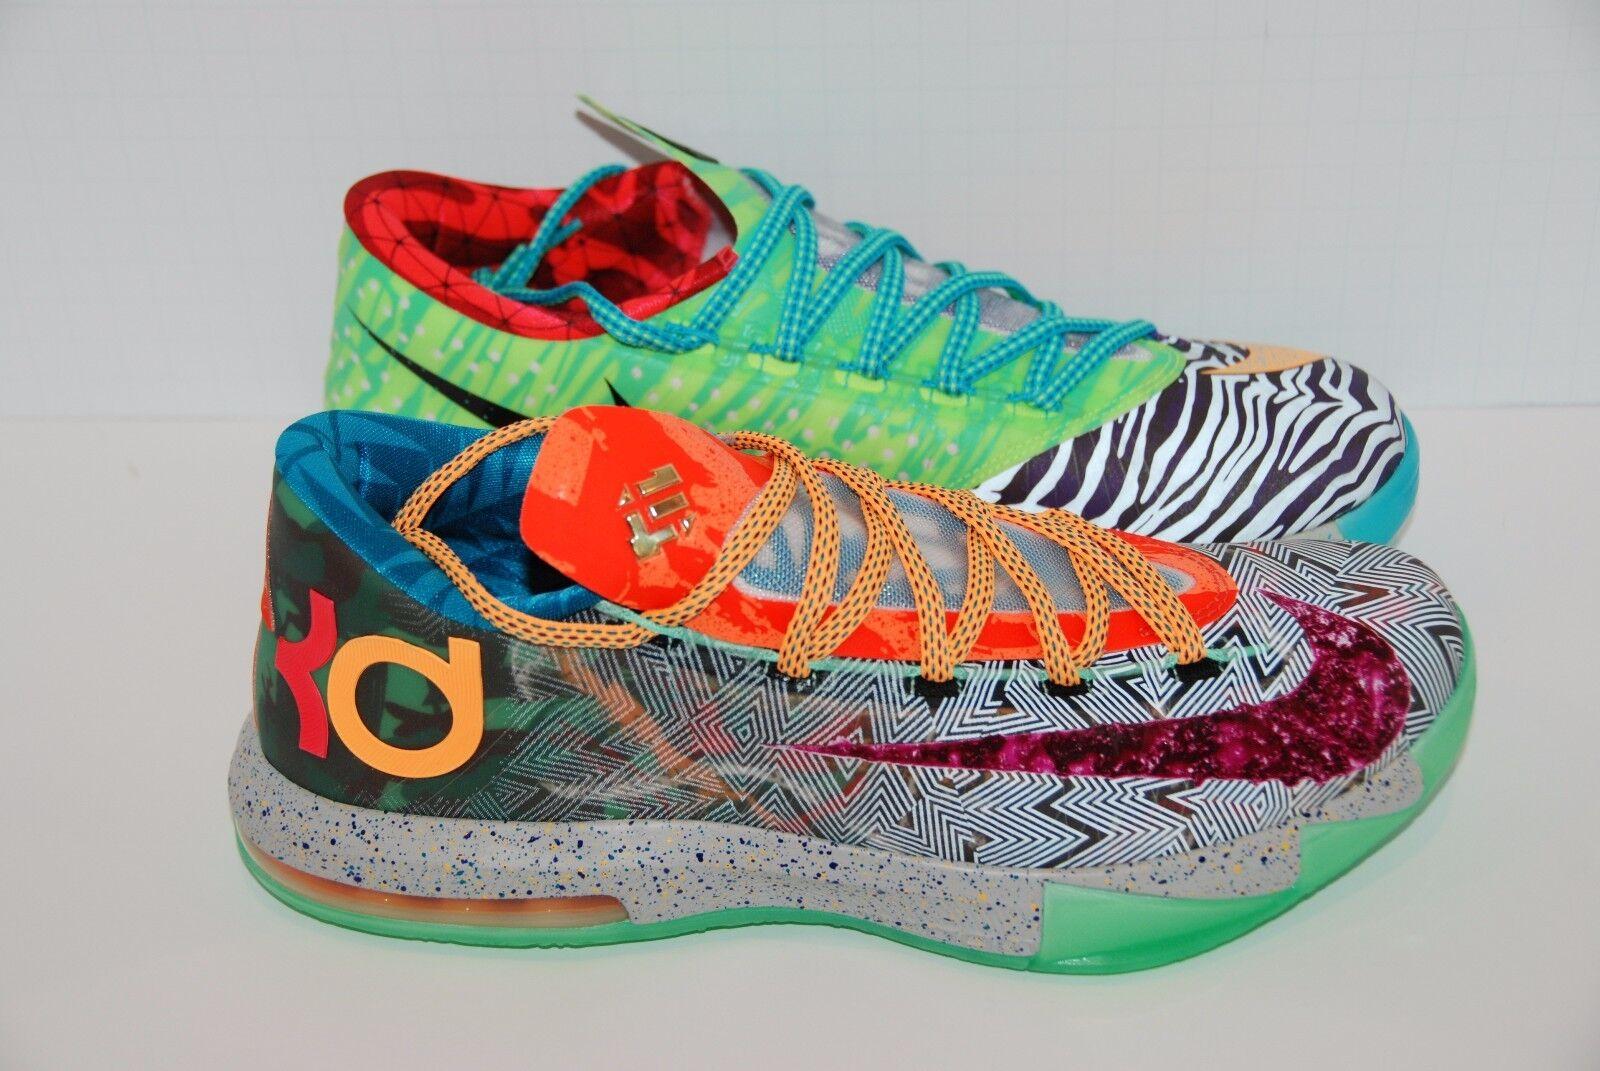 Nike KD VI 6 Premium WHAT THE KD size 8.5 US BRAND NEW